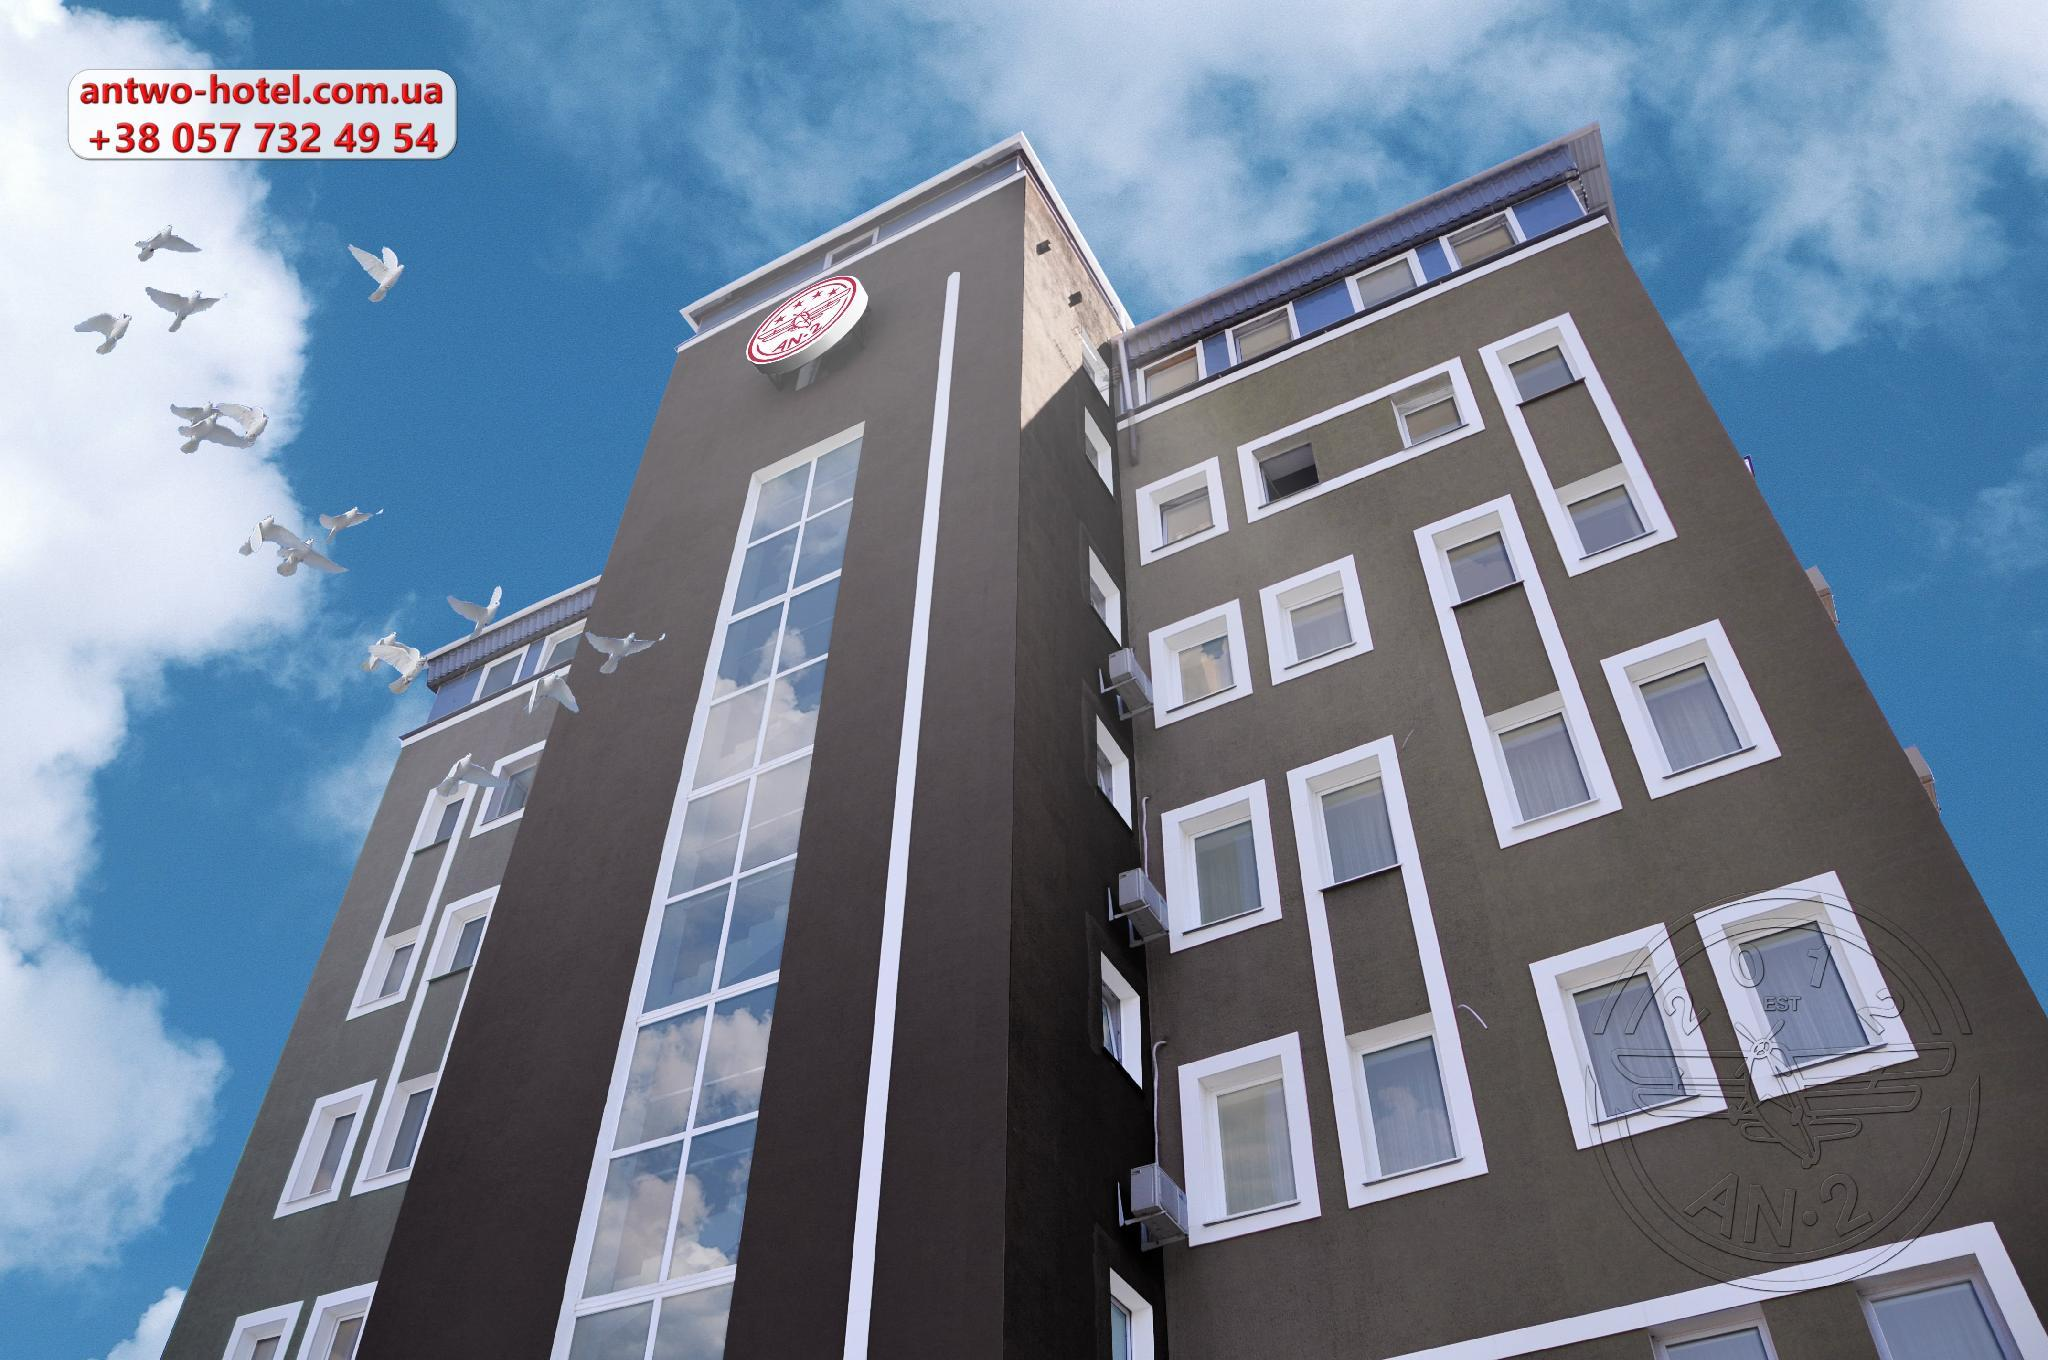 AN 2 Hotel